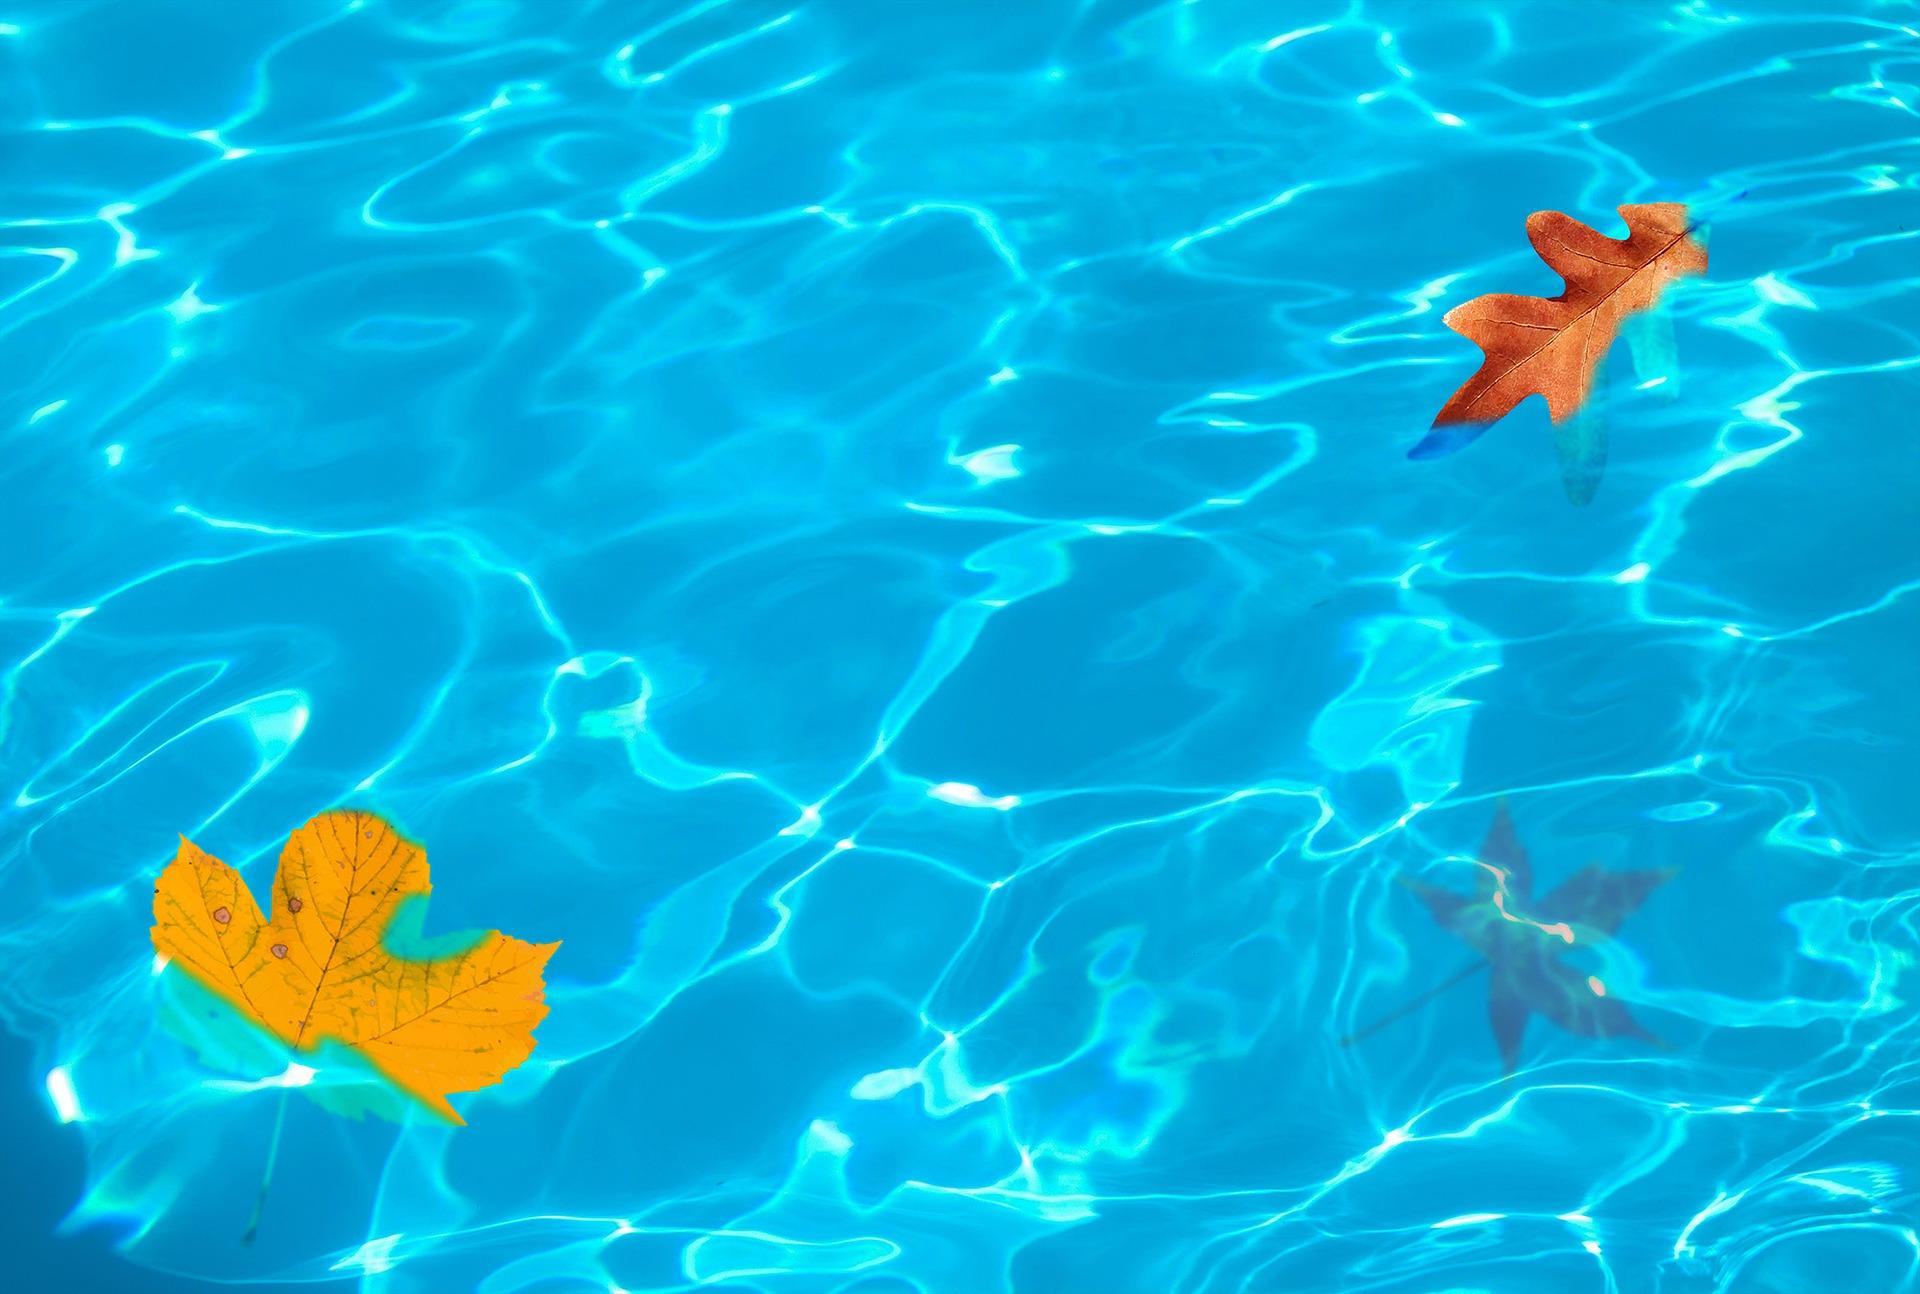 Maryland-Inground-Pools-thankful-for-inground-pool-woodfield-outdoors